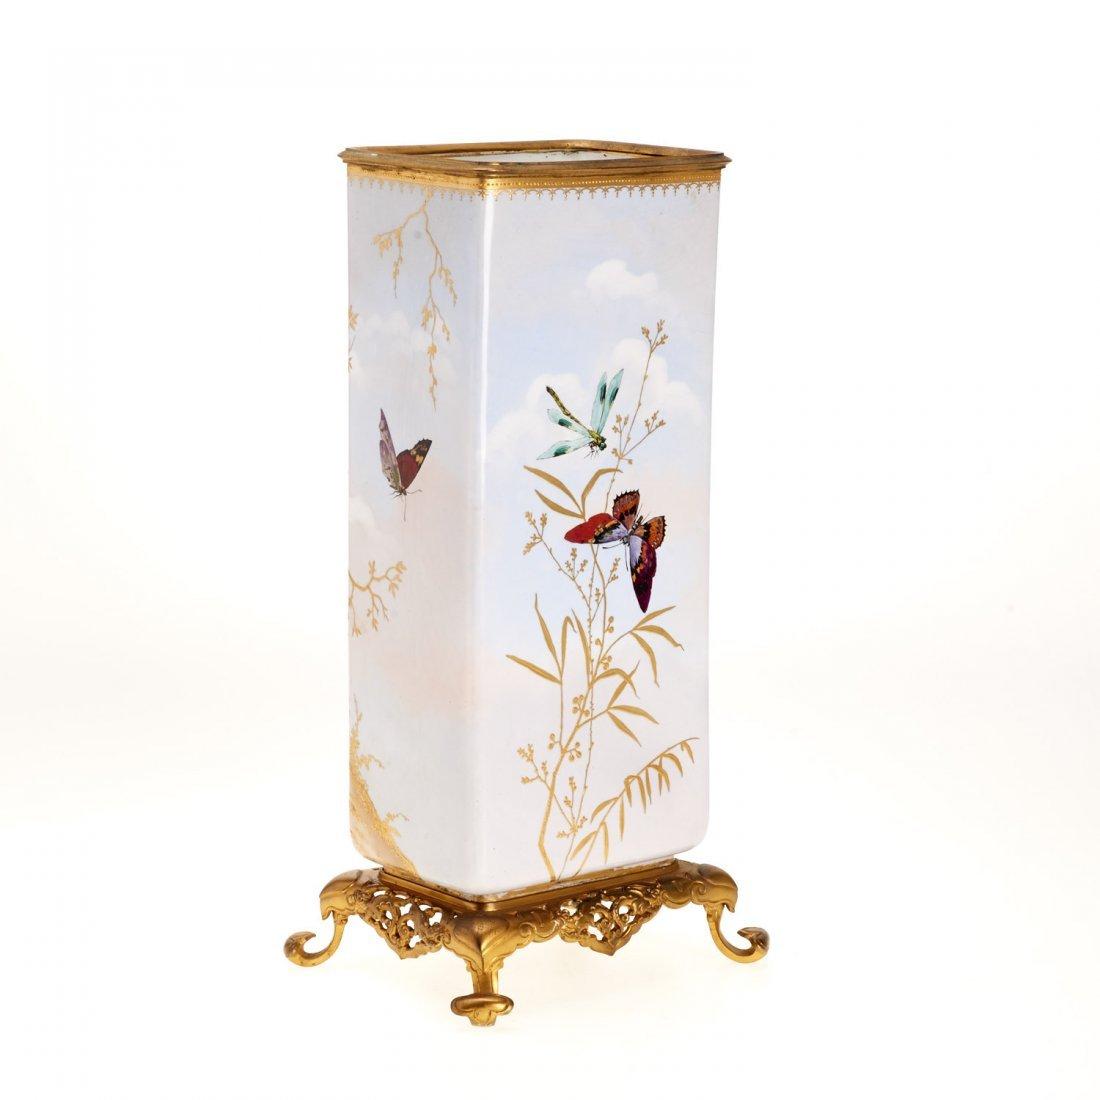 Gilt bronze mounted porcelain vase signed Baston - 5